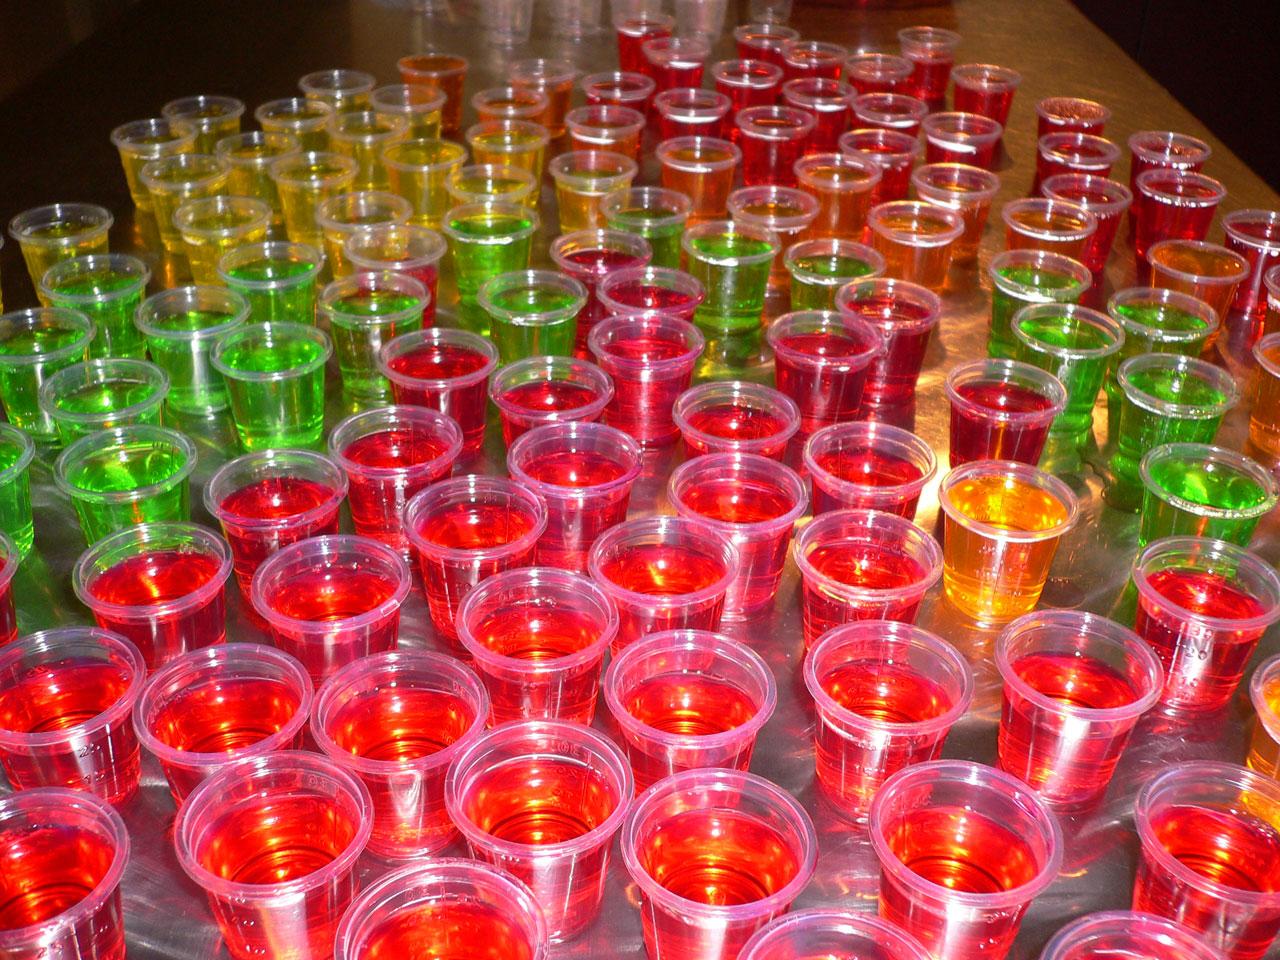 hosting-a-vodka-tasting-party